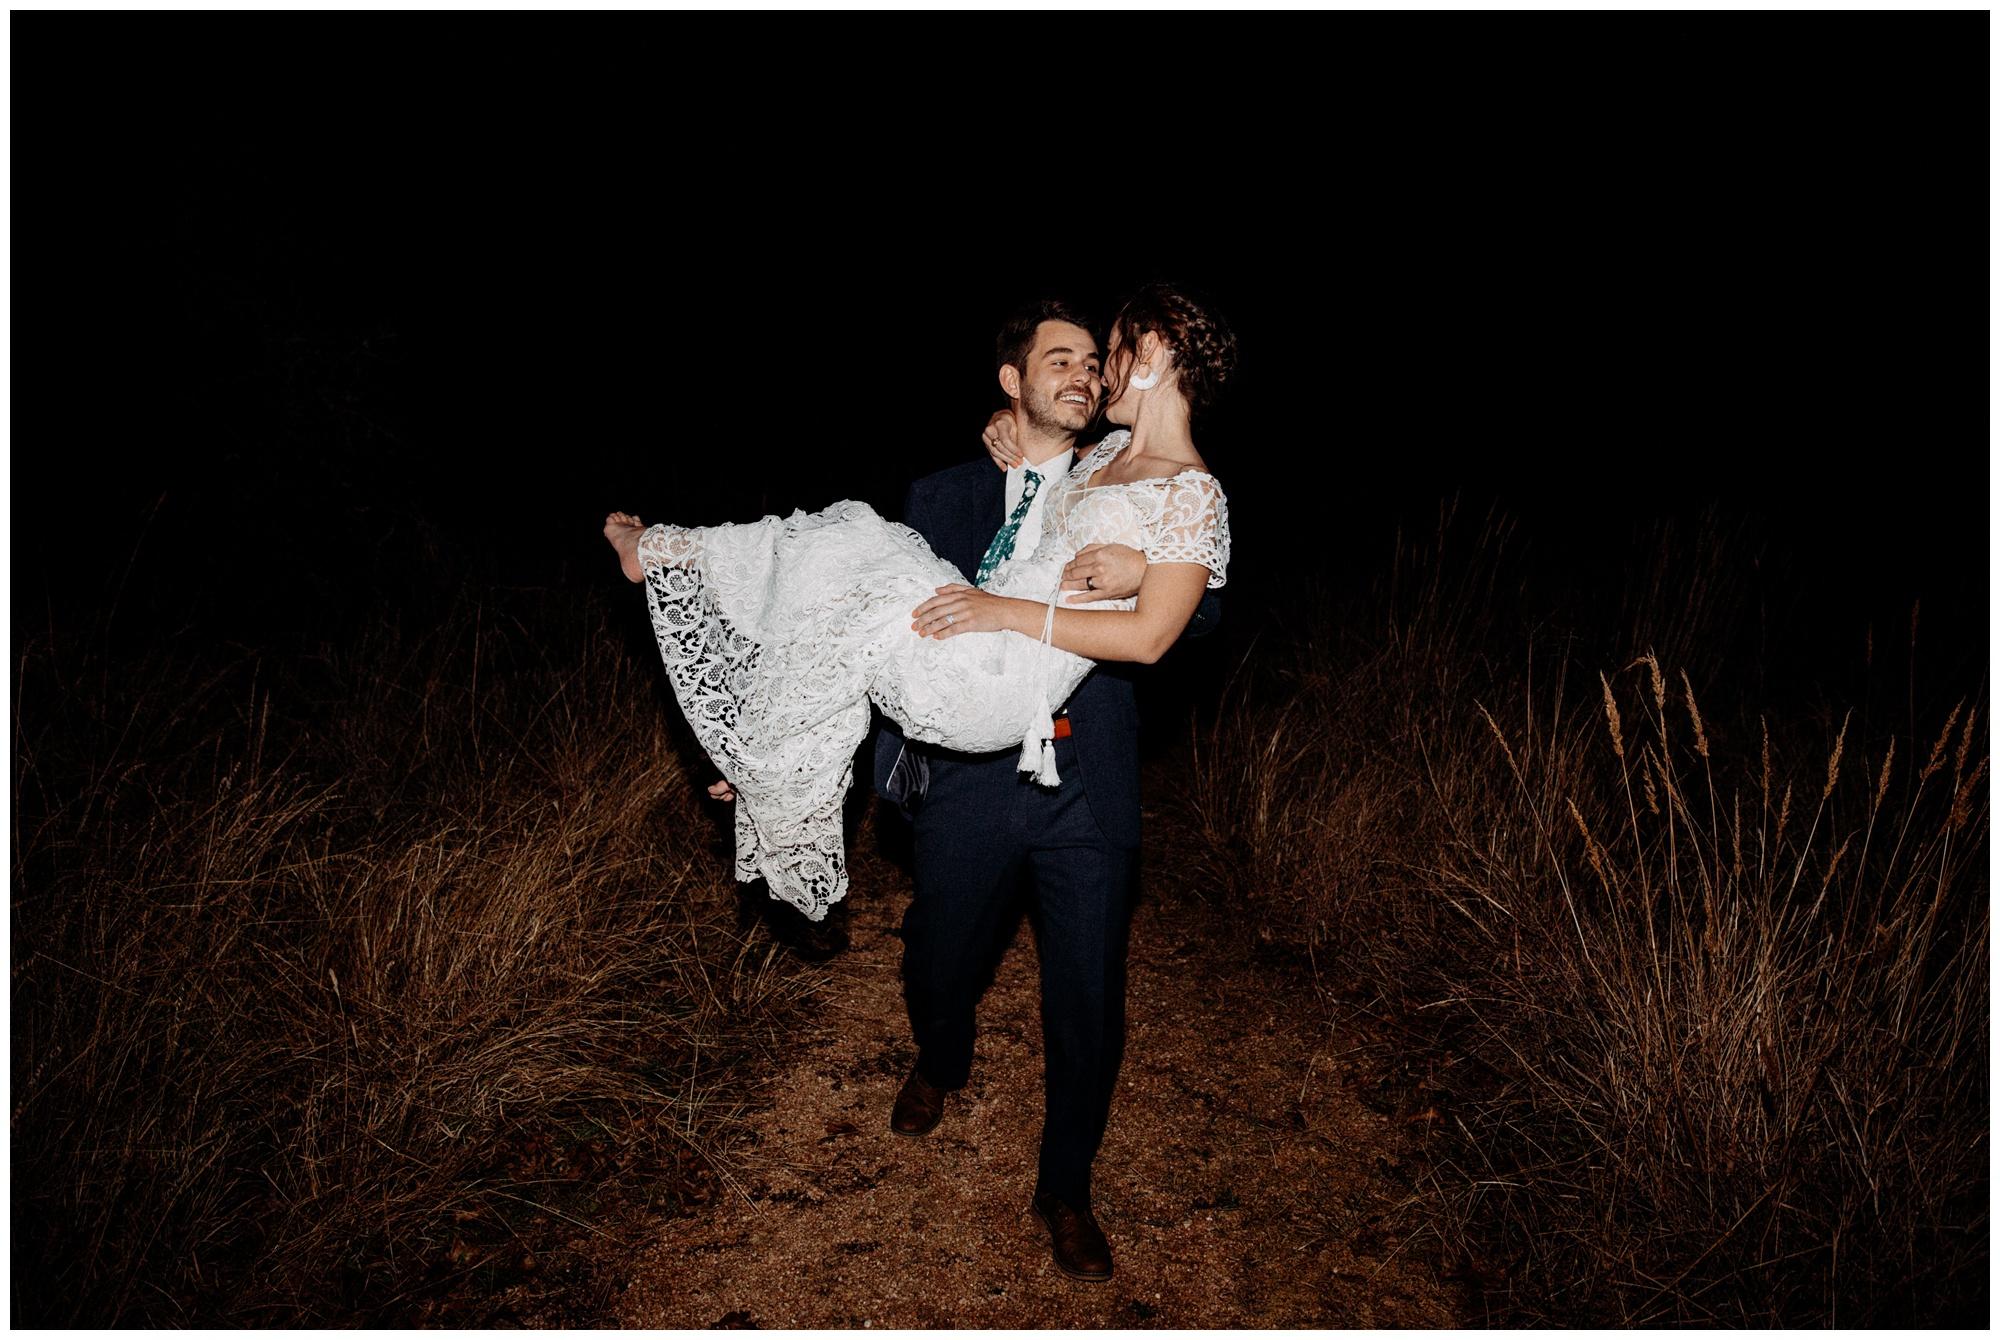 AUSTIN-TEXAS-PROSPECT-HOUSE-WEDDING-VENUE-PHOTOGRAPHY25869.JPG